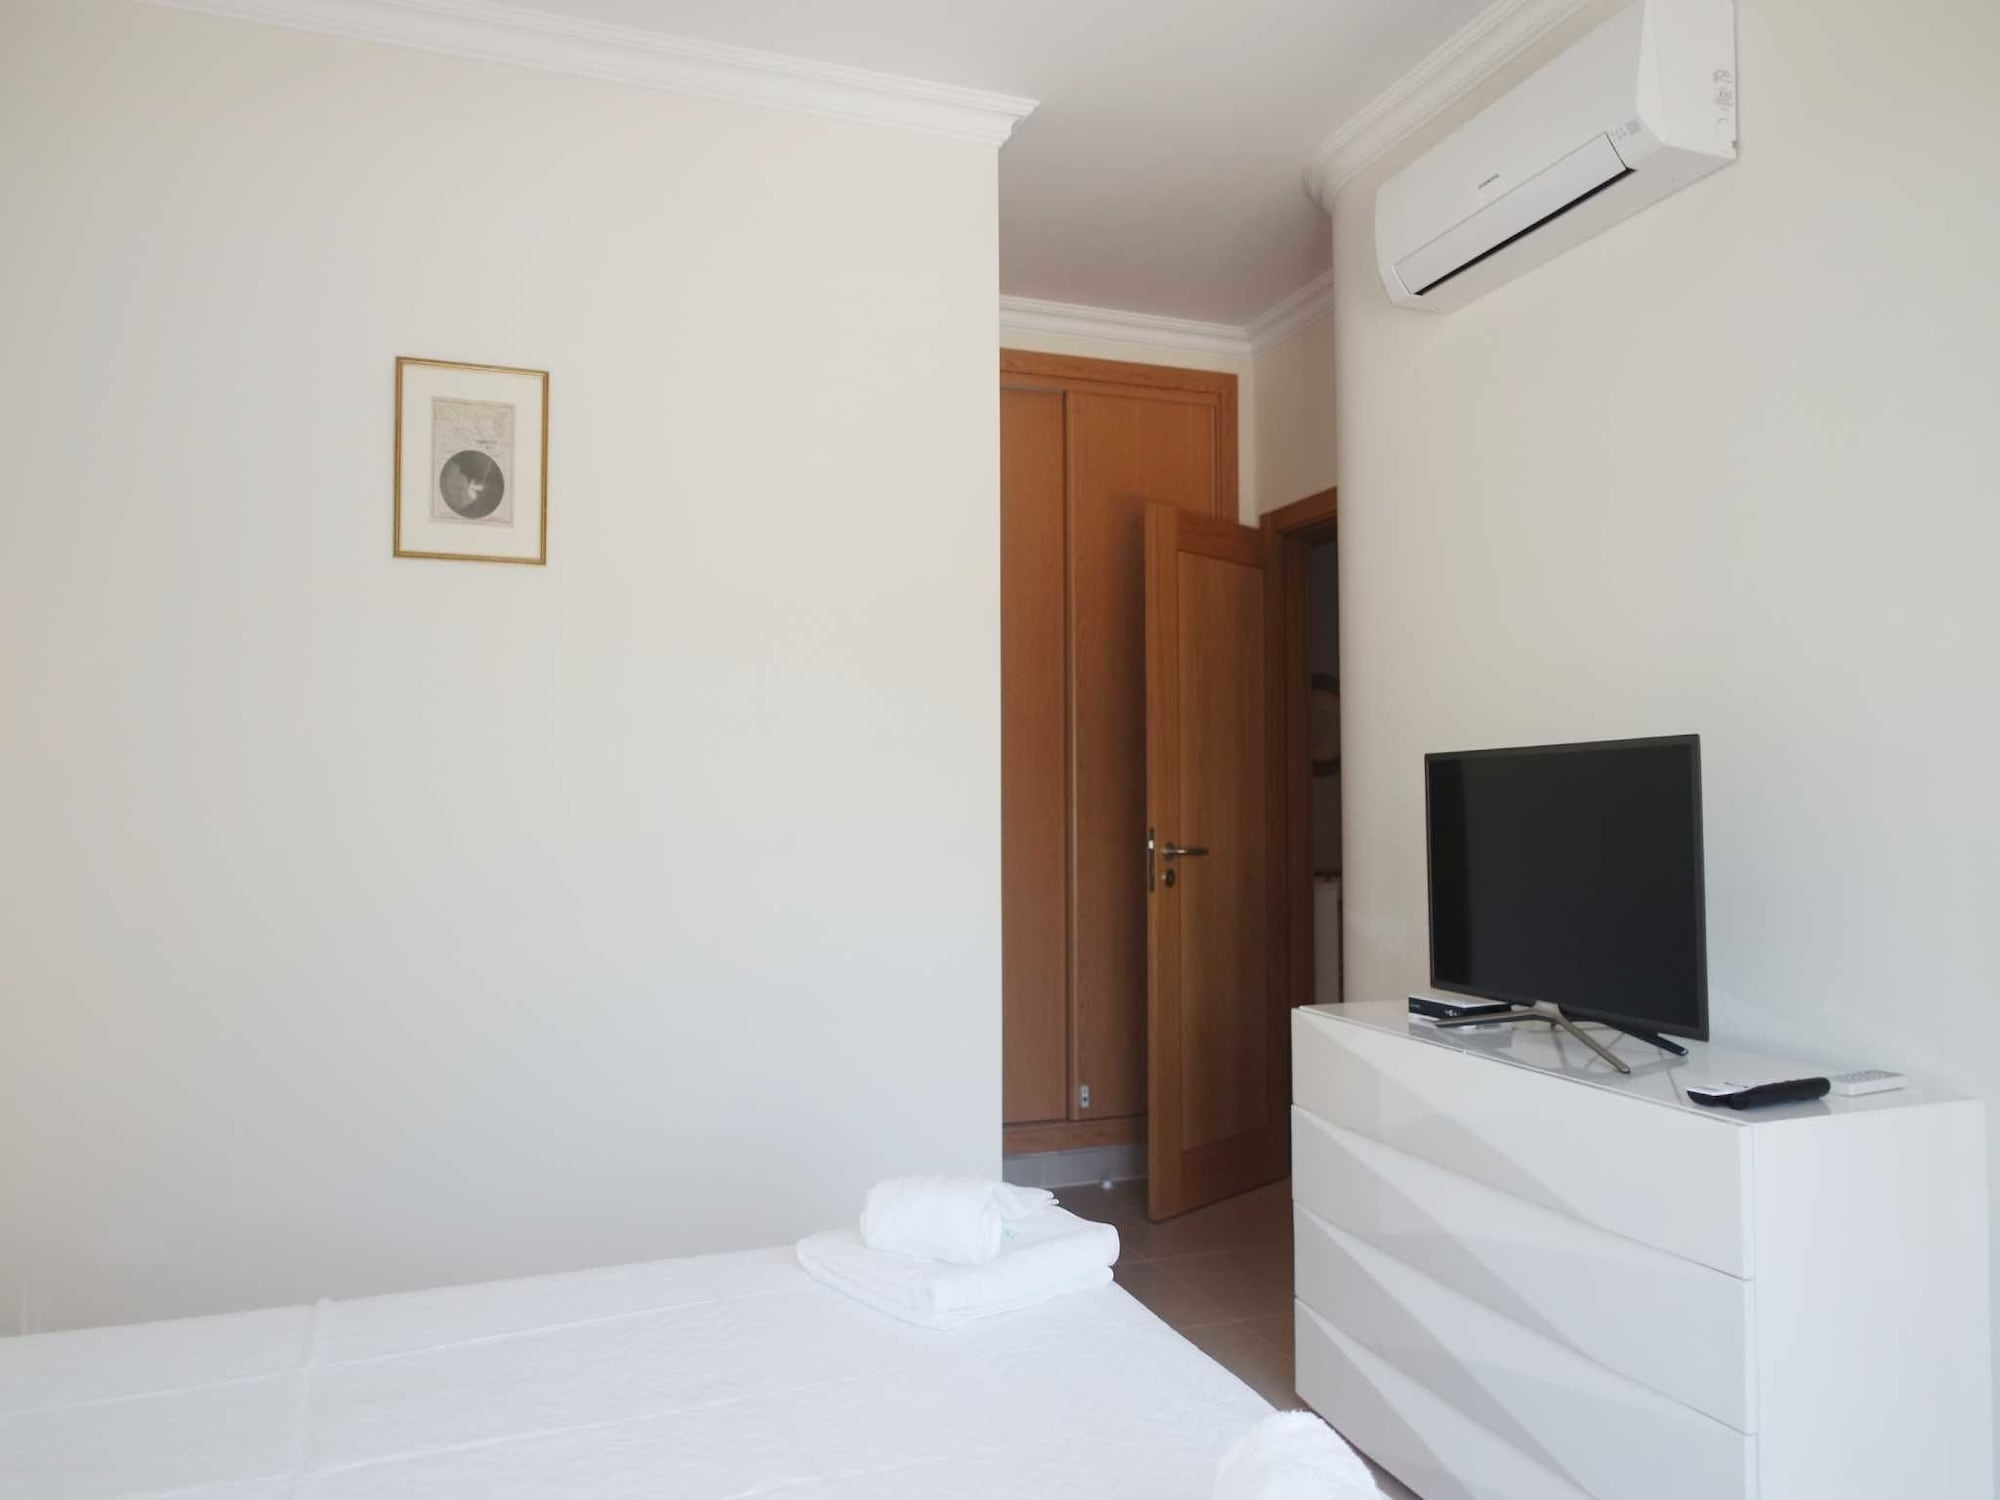 B23 - Encosta Apartment by DreamAlgarve, Lagos